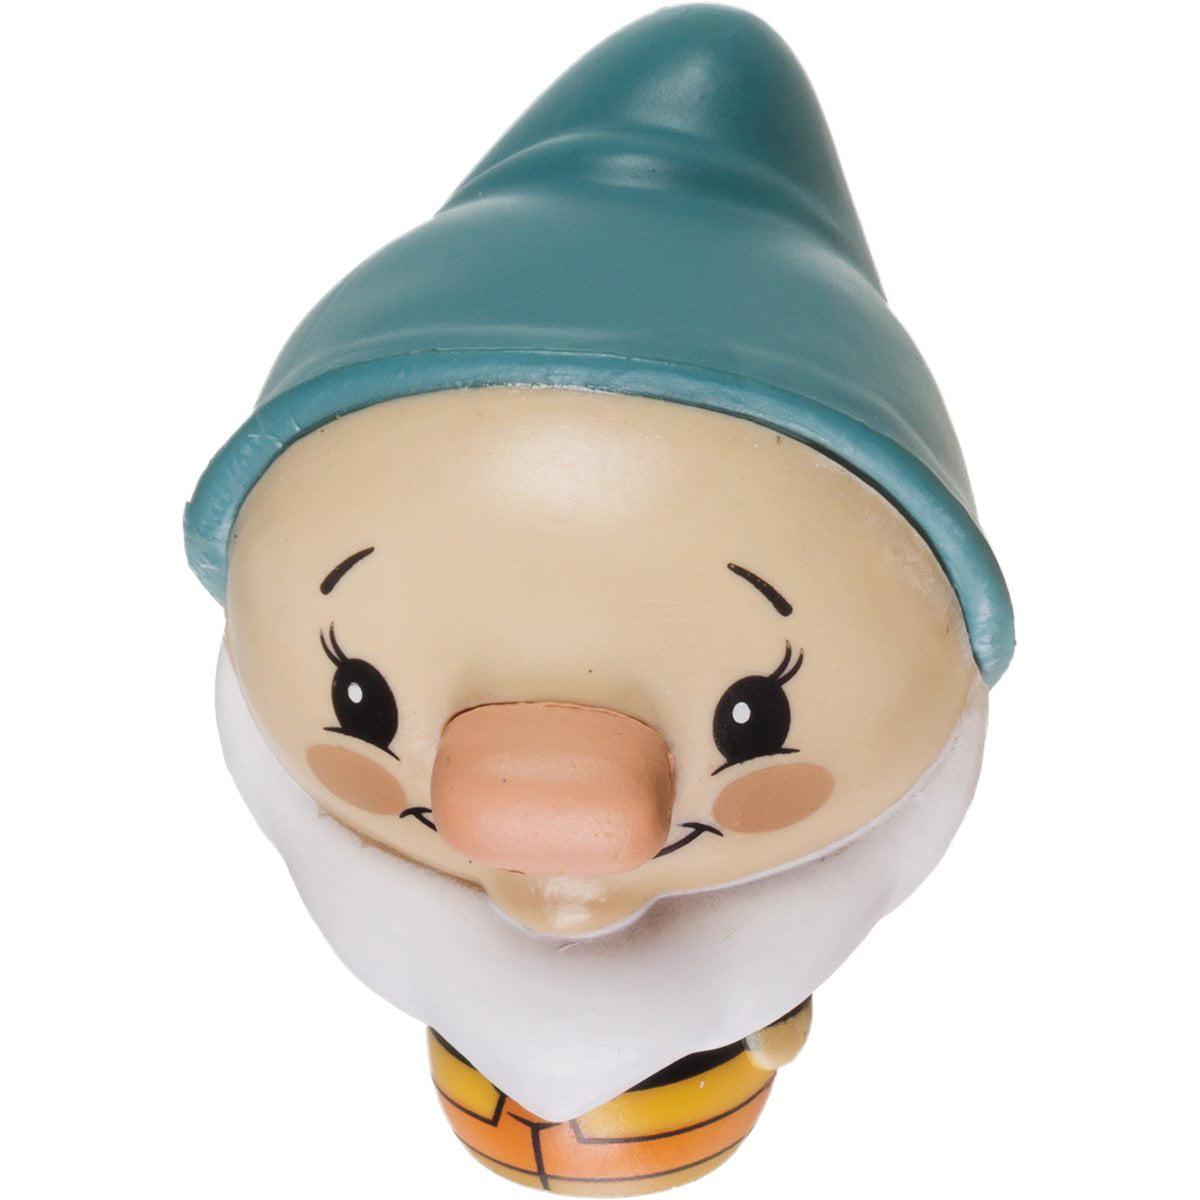 Bashful: Funko Pint Size Heroes x Disney - Snow White Micro Vinyl Figure (21217)